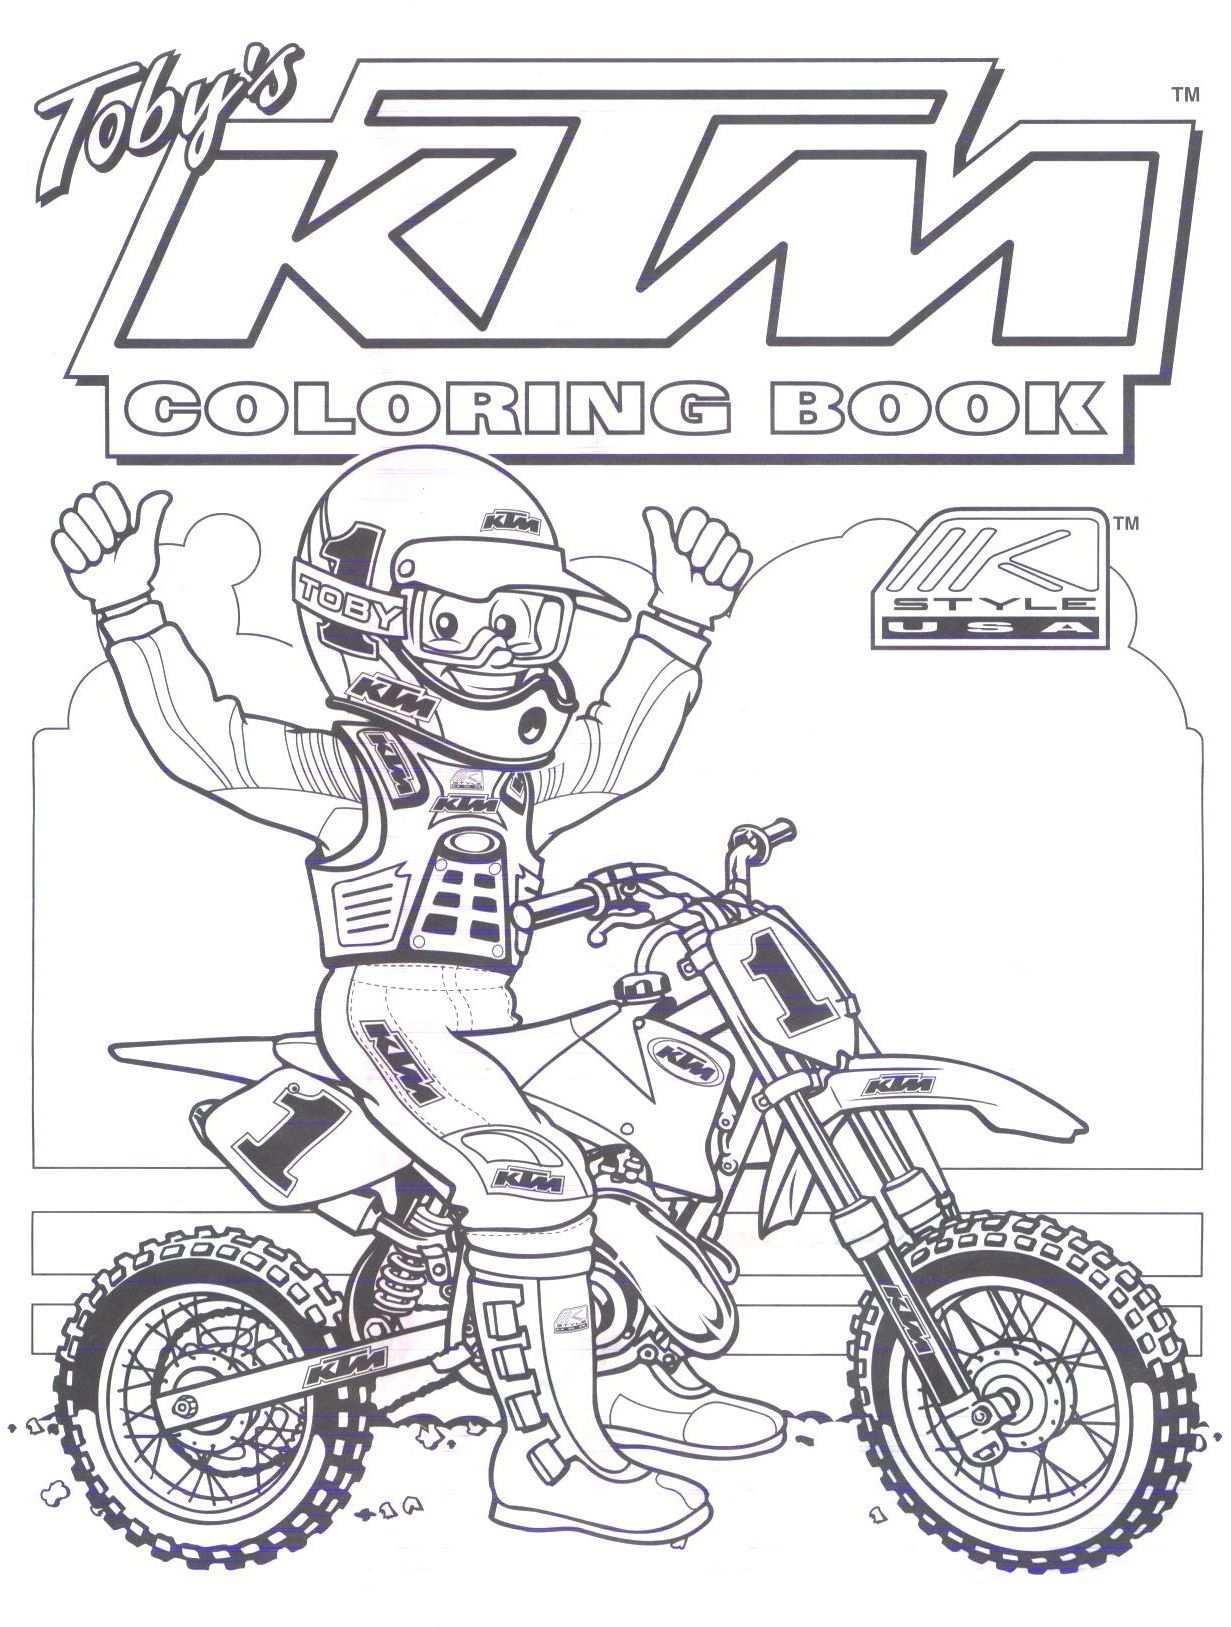 Ktm Dirt Bike Coloring Pages Dirt Bike Birthday Bike Birthday Parties Ktm Dirt Bikes